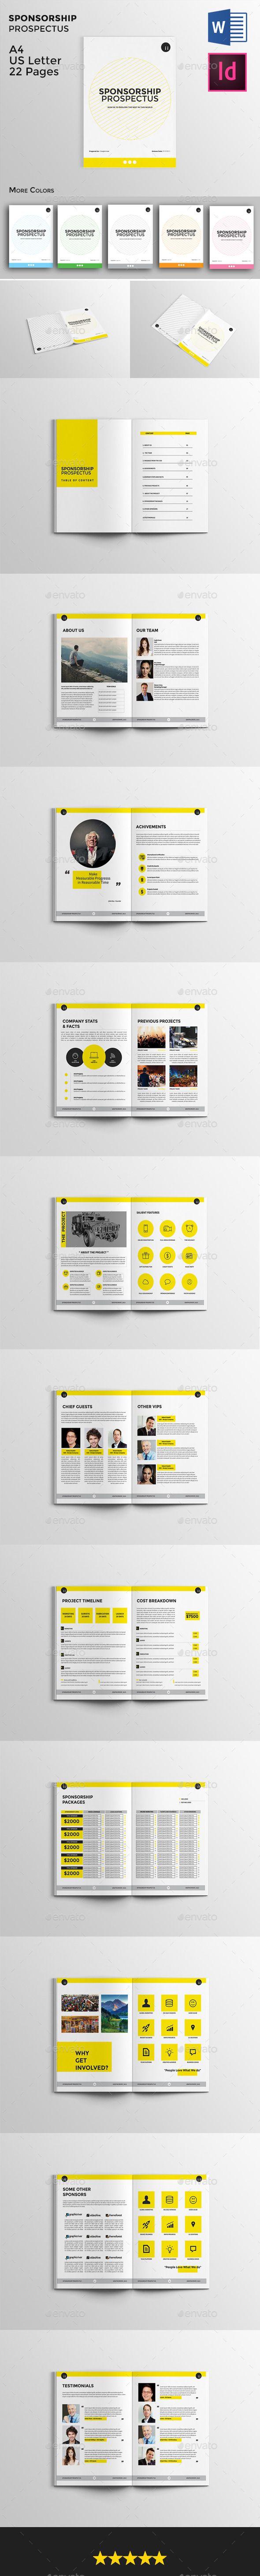 Sponsorship Prospectus Template #design Download: http://graphicriver.net/item/sponsorship-prospectus/12200118?ref=ksioks